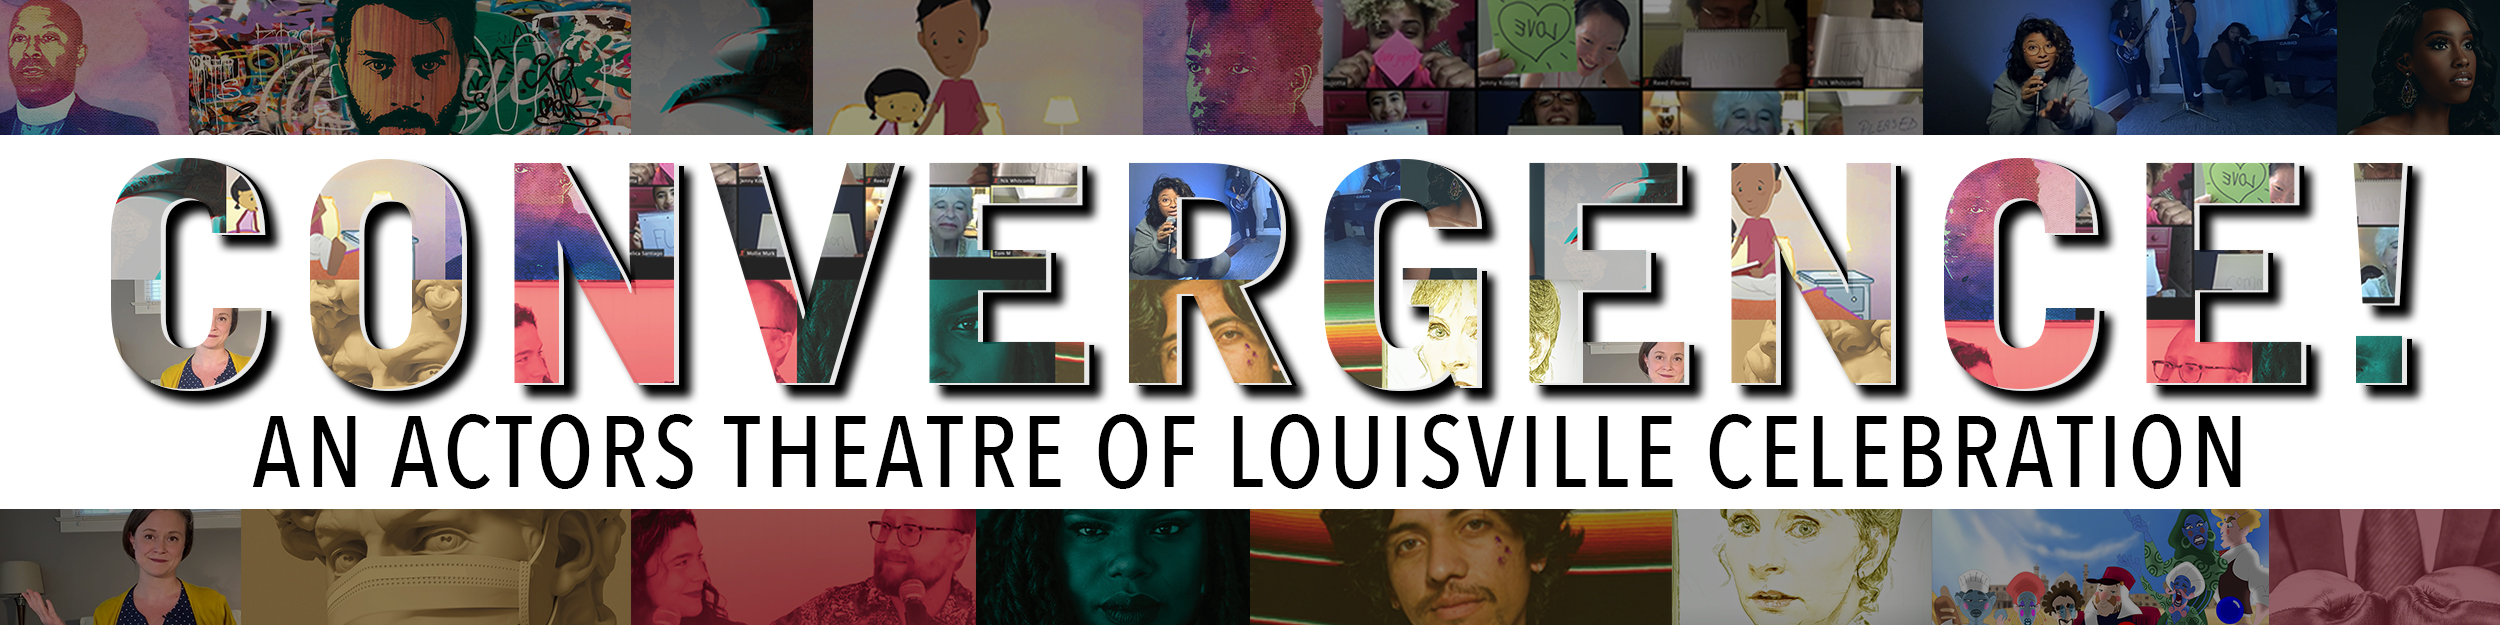 Convergence! An Actors Theatre of Louisville Celebration